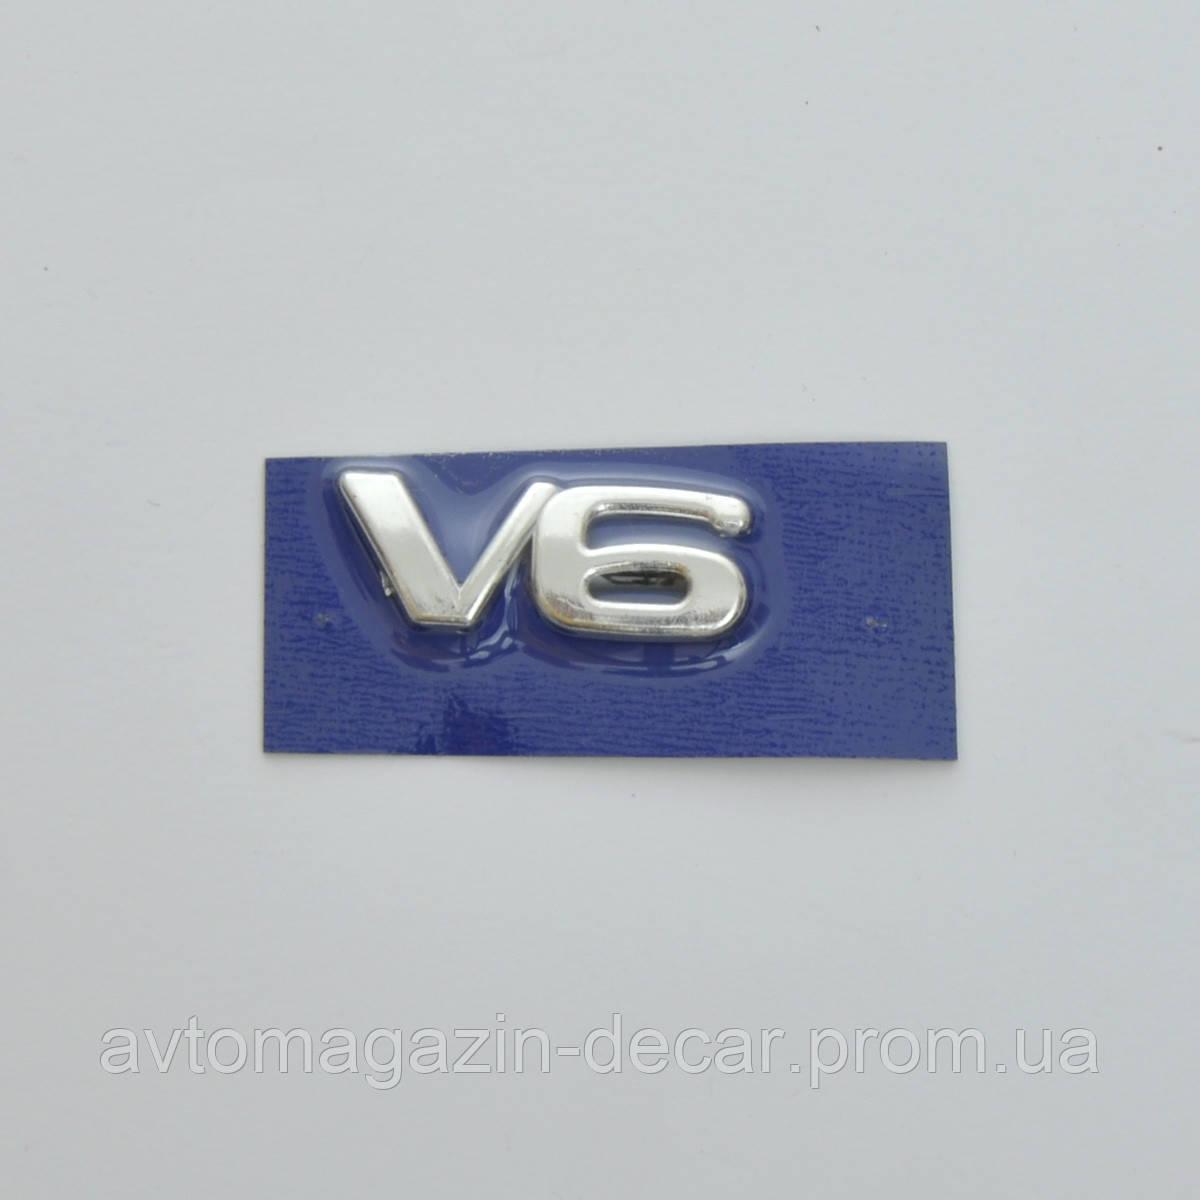 "Эмблема - надпись   ""V 6"" скотч 47х17 мм (5690)"